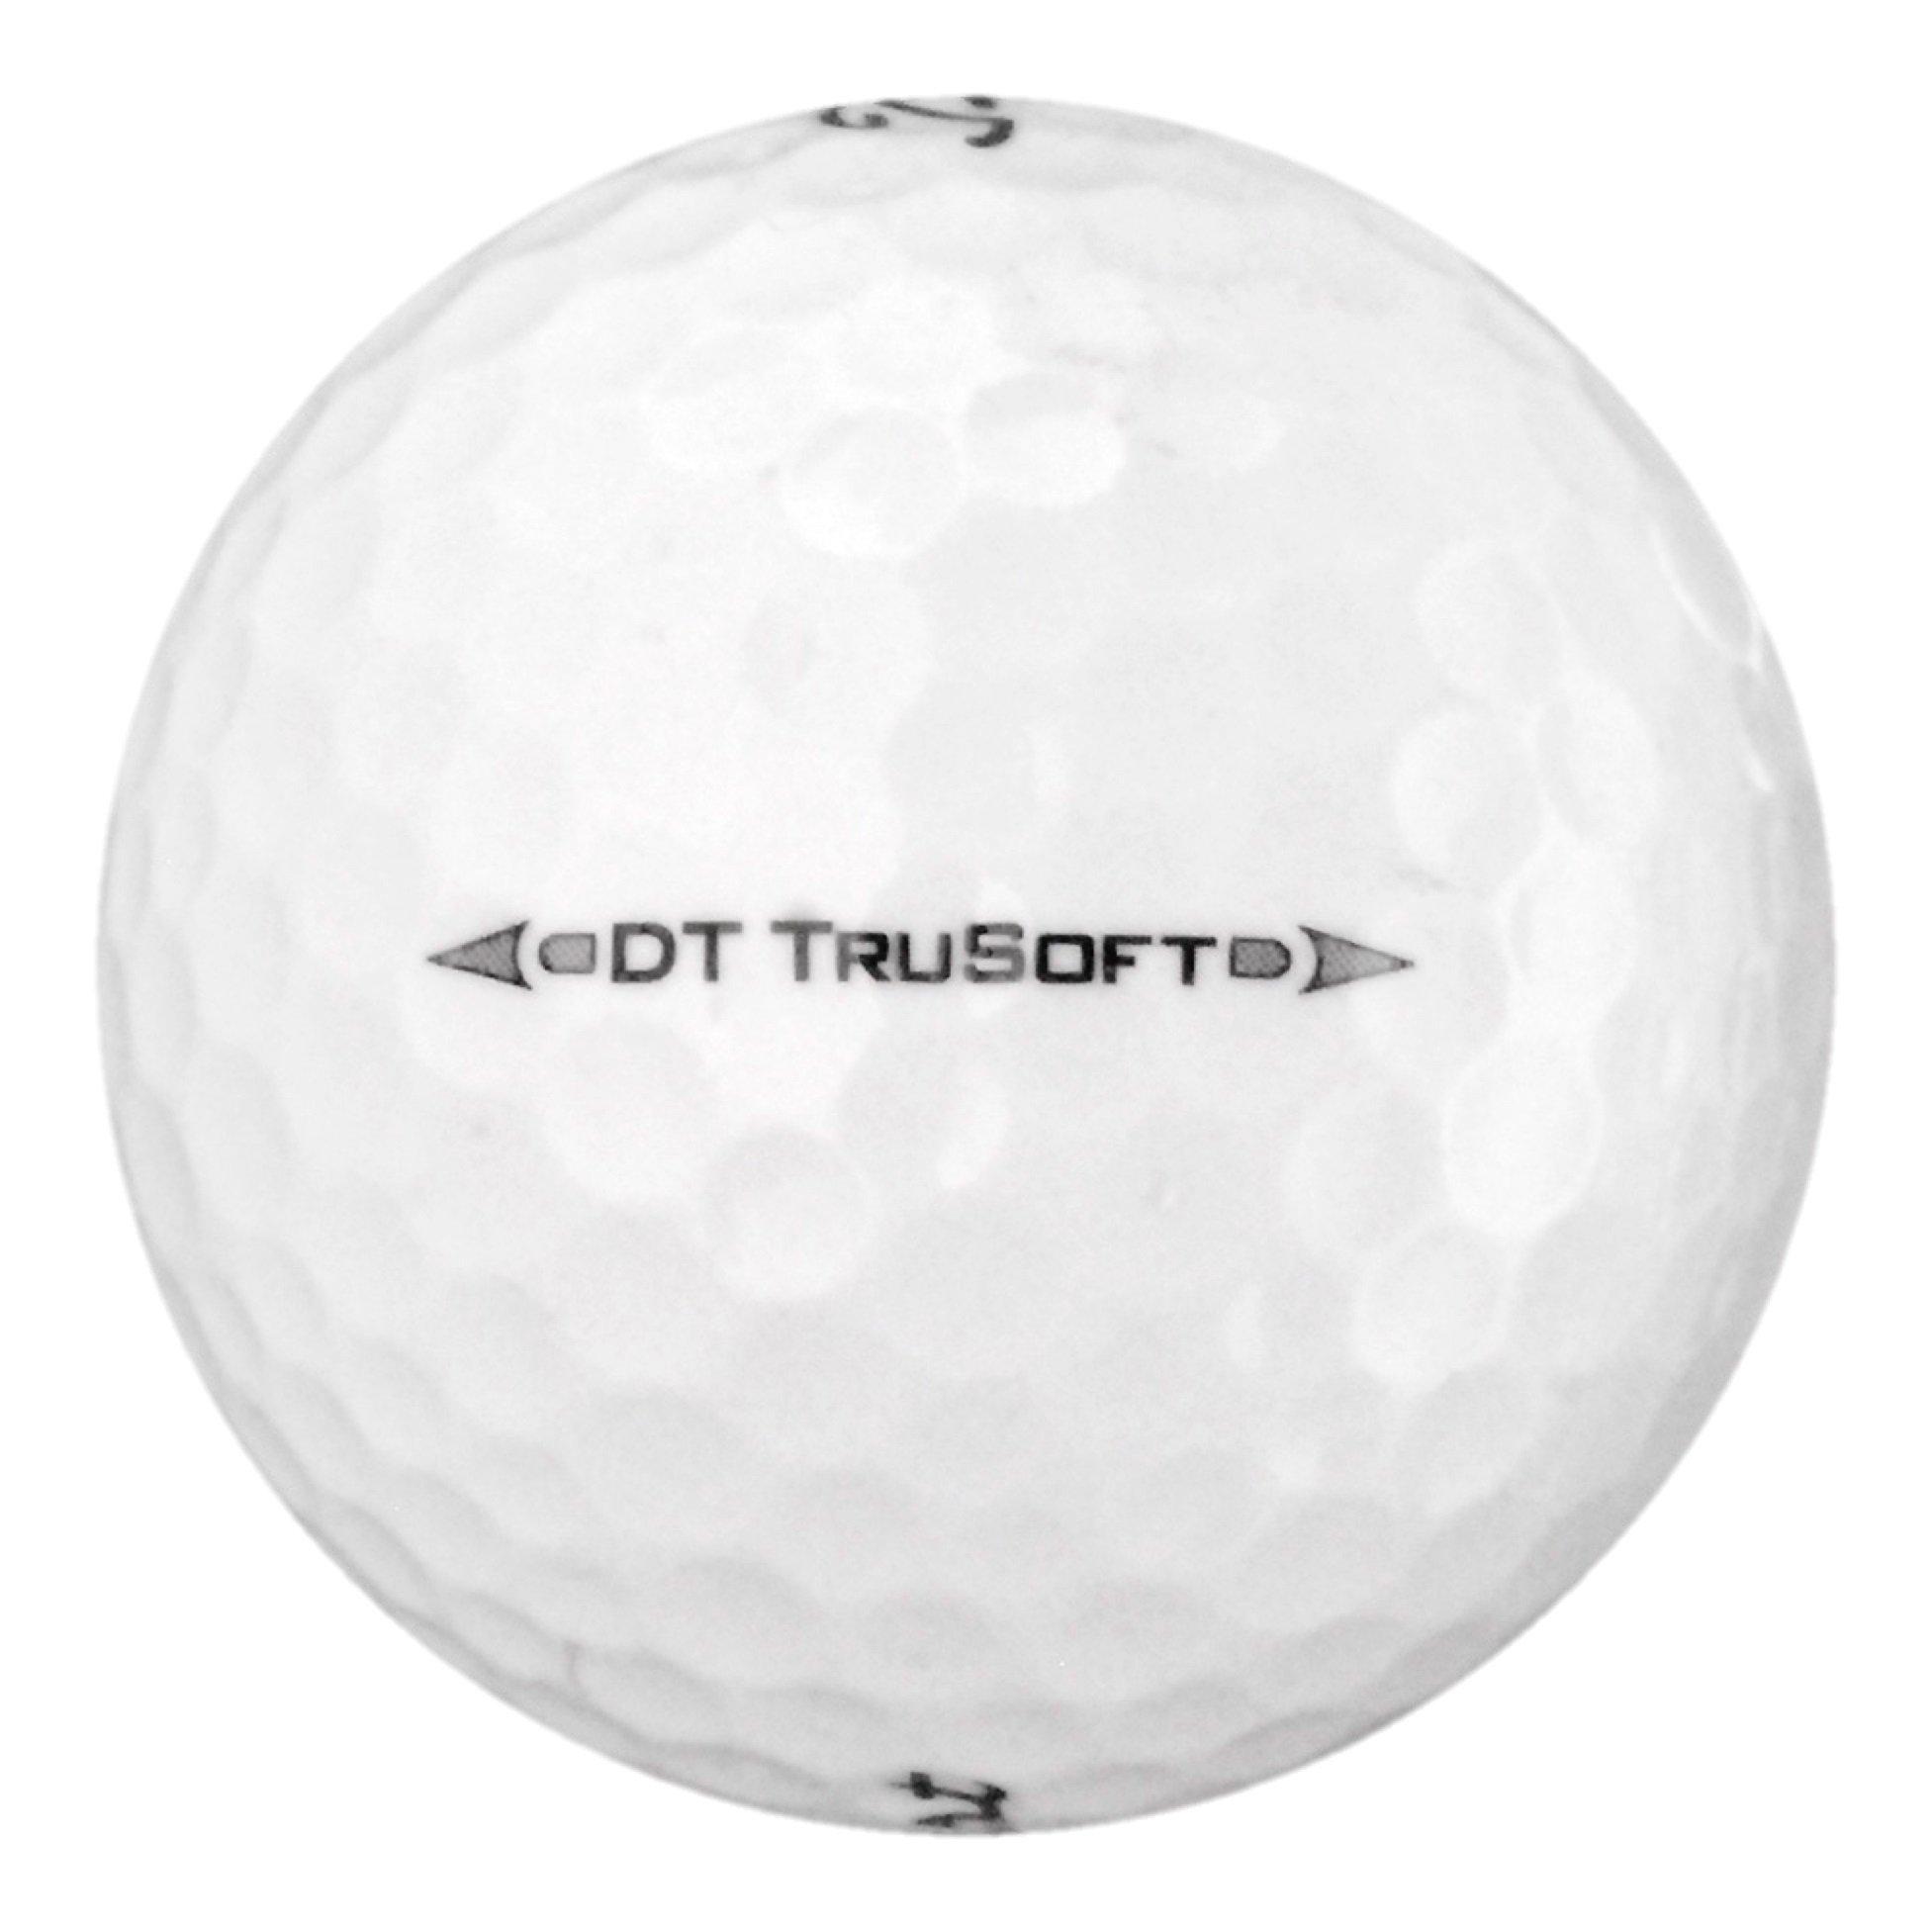 Titleist 24 DT TruSoft - Mint (AAAAA) Grade - Recycled (Used) Golf Balls by Titleist